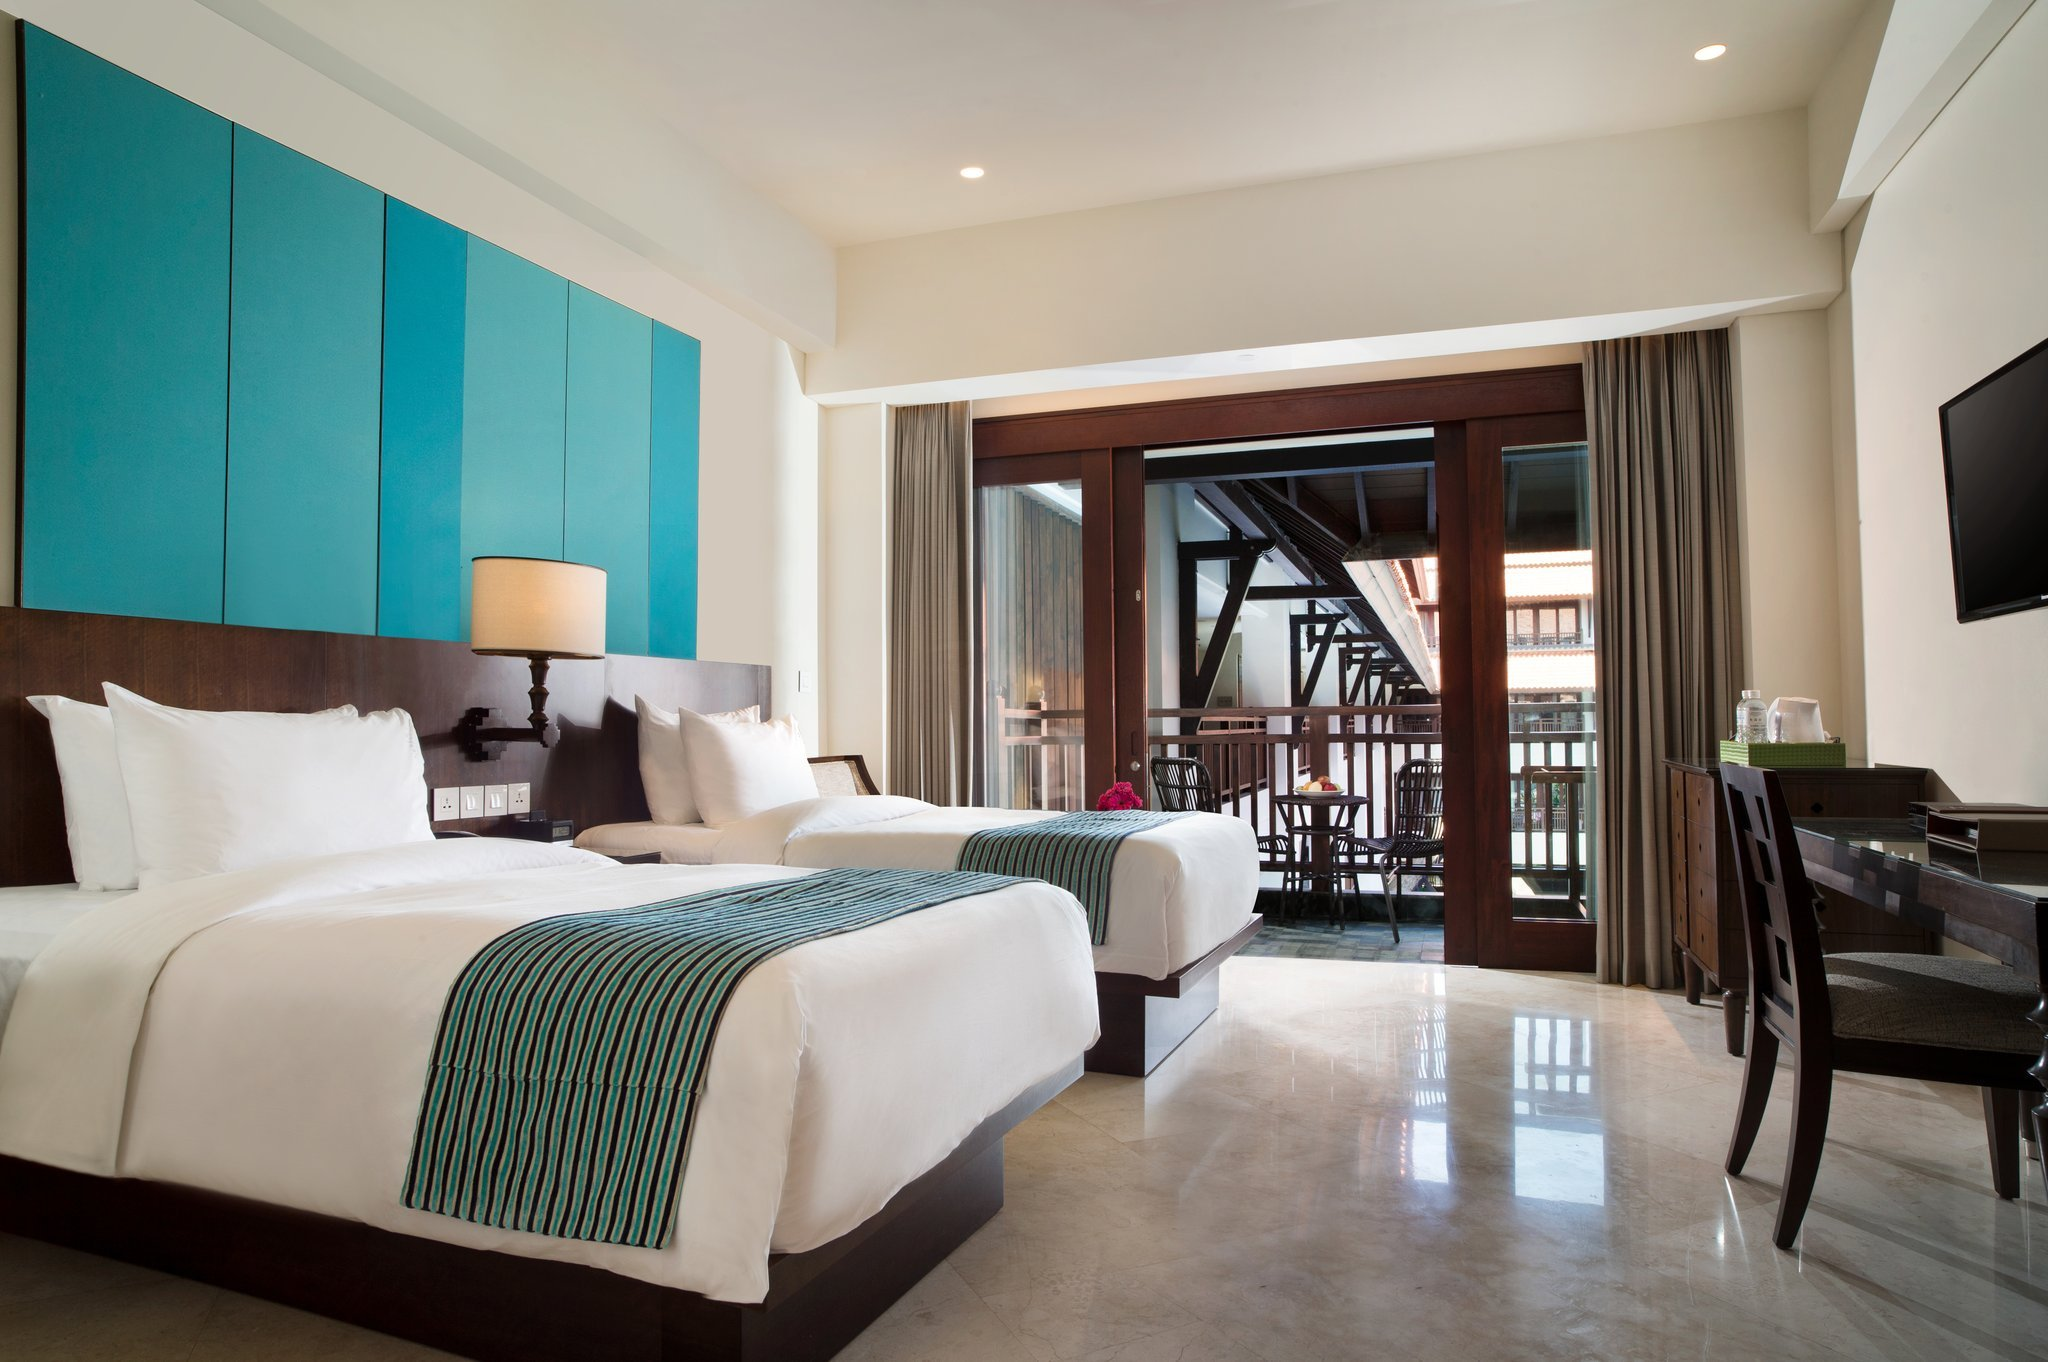 Peninsula Beach Resort Tanjung Benoa